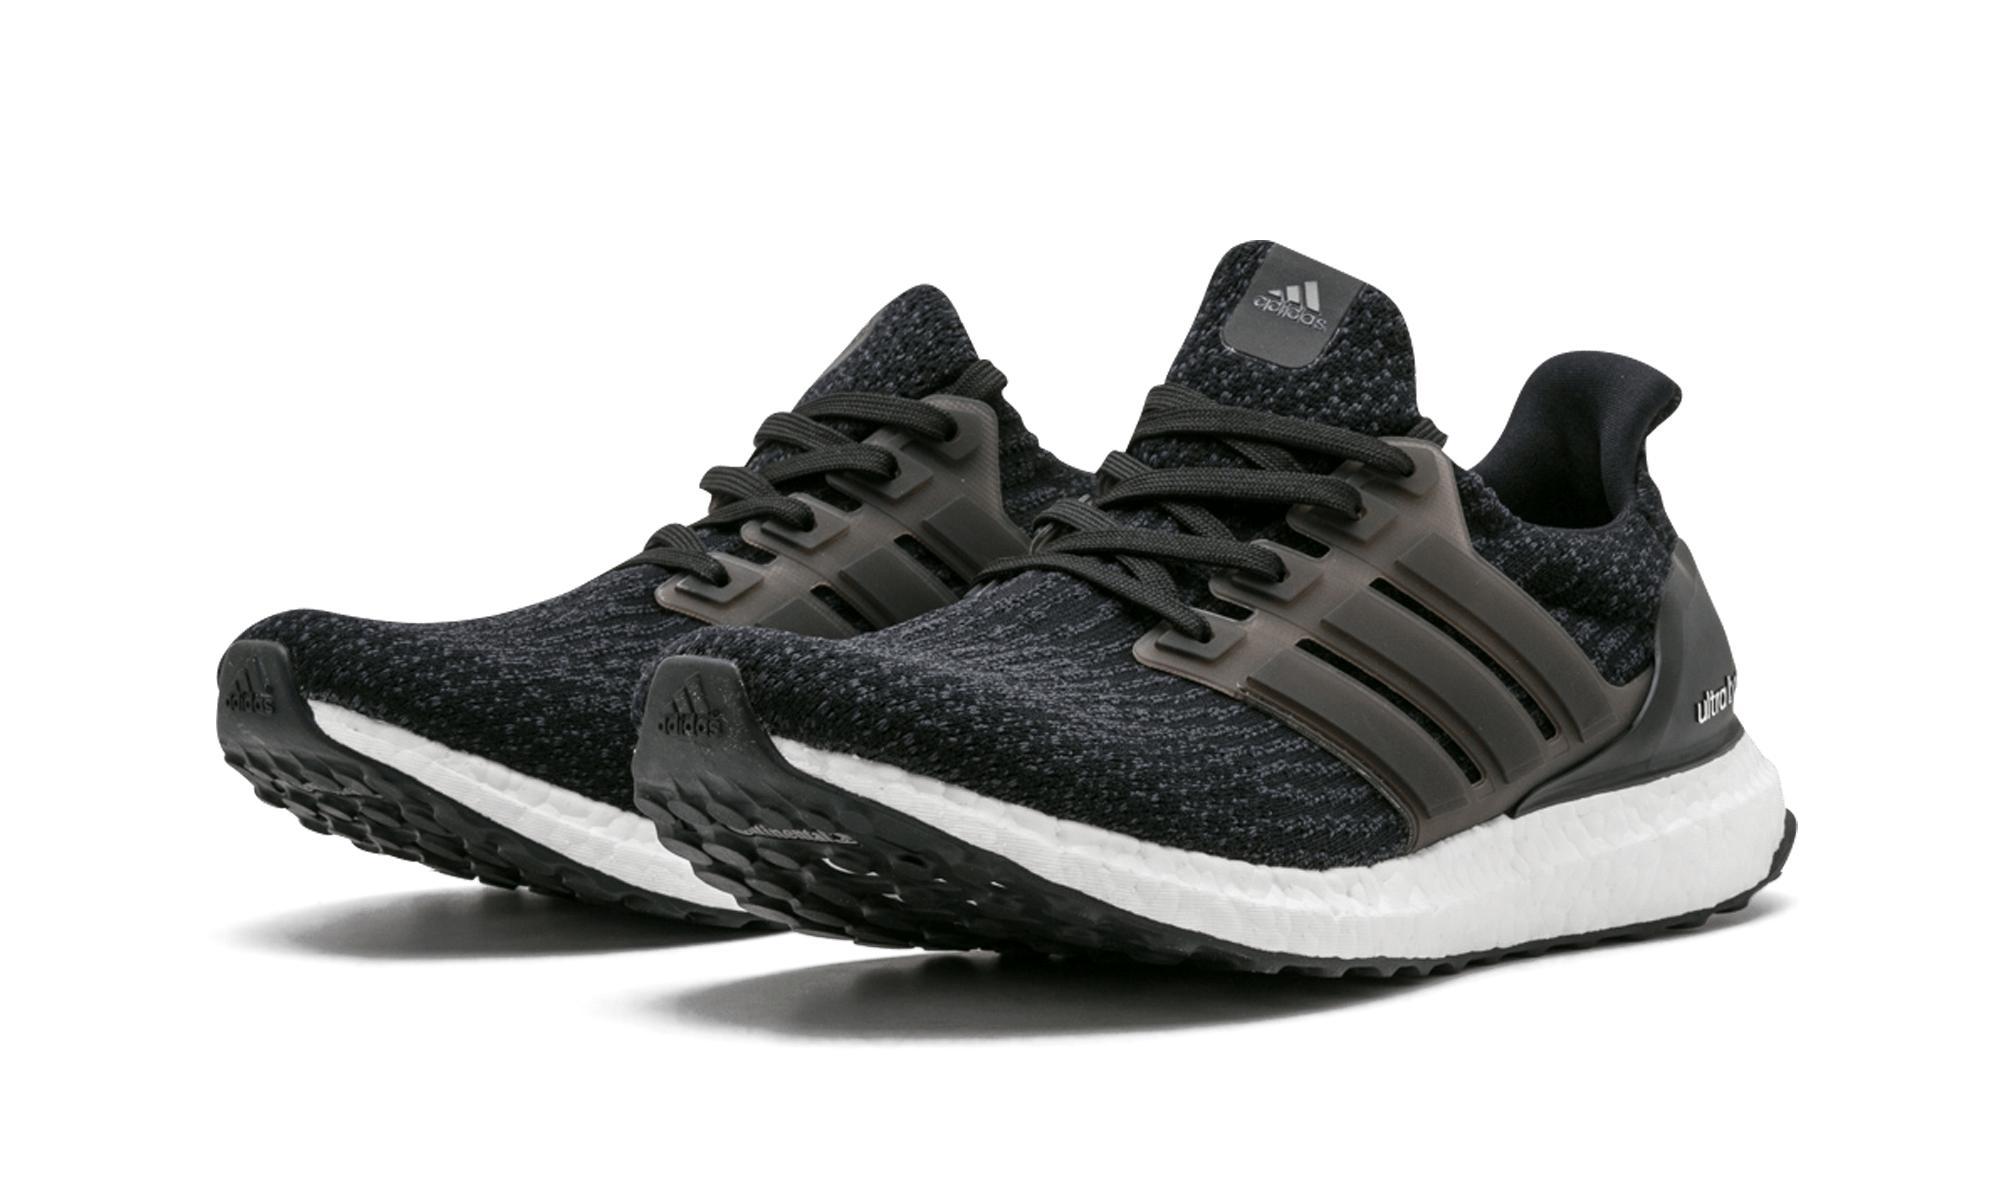 b5e549037dc9a Adidas - Black Ultraboost for Men - Lyst. View fullscreen